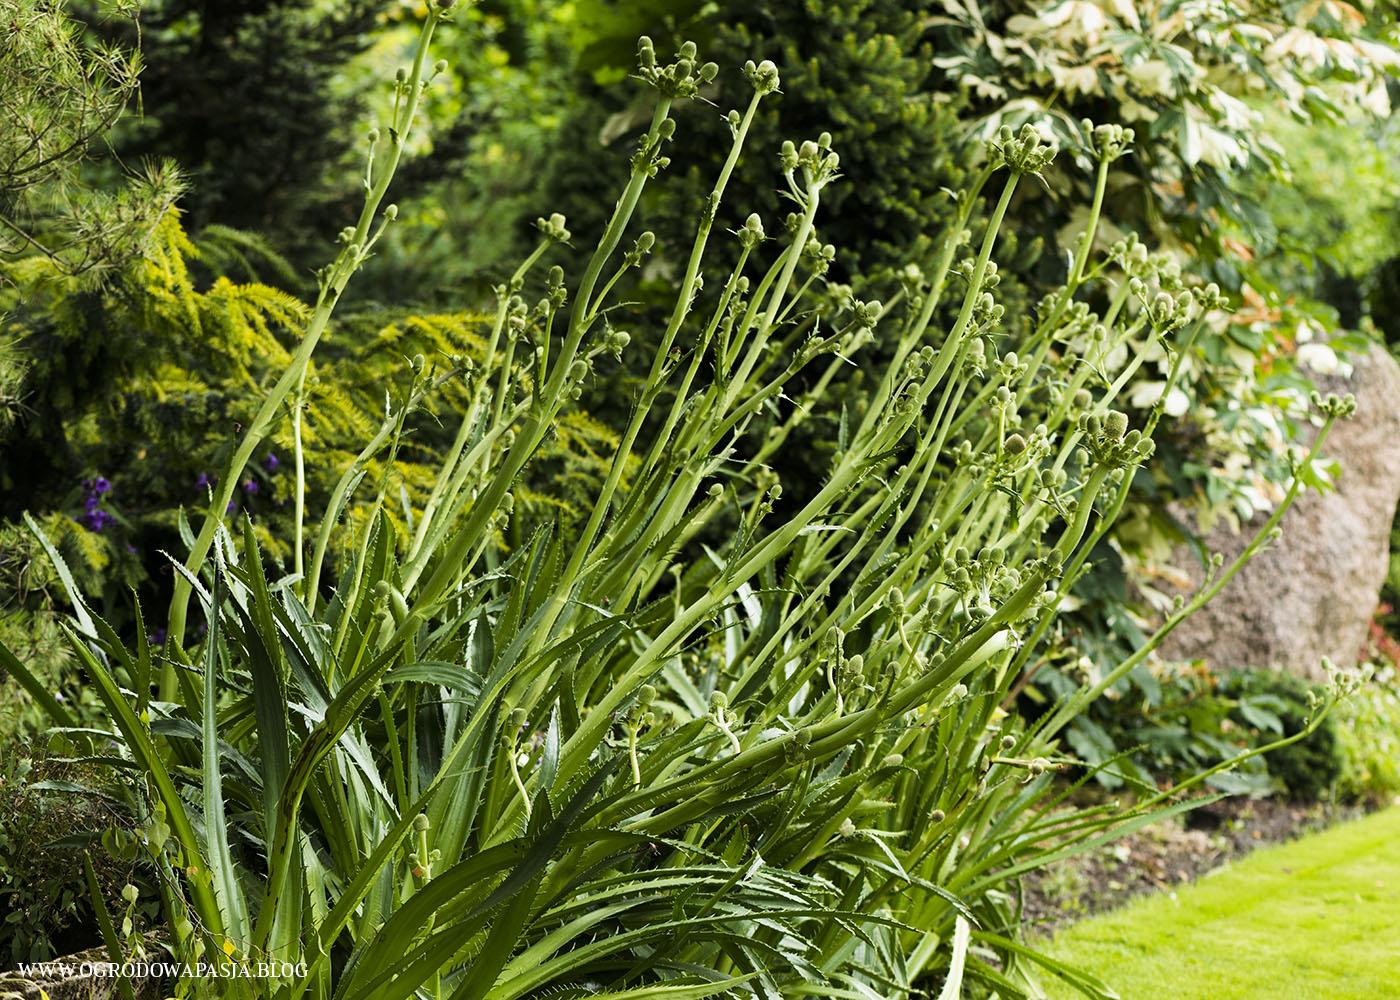 Mikołajek agawolistny Eryngium agavifolium